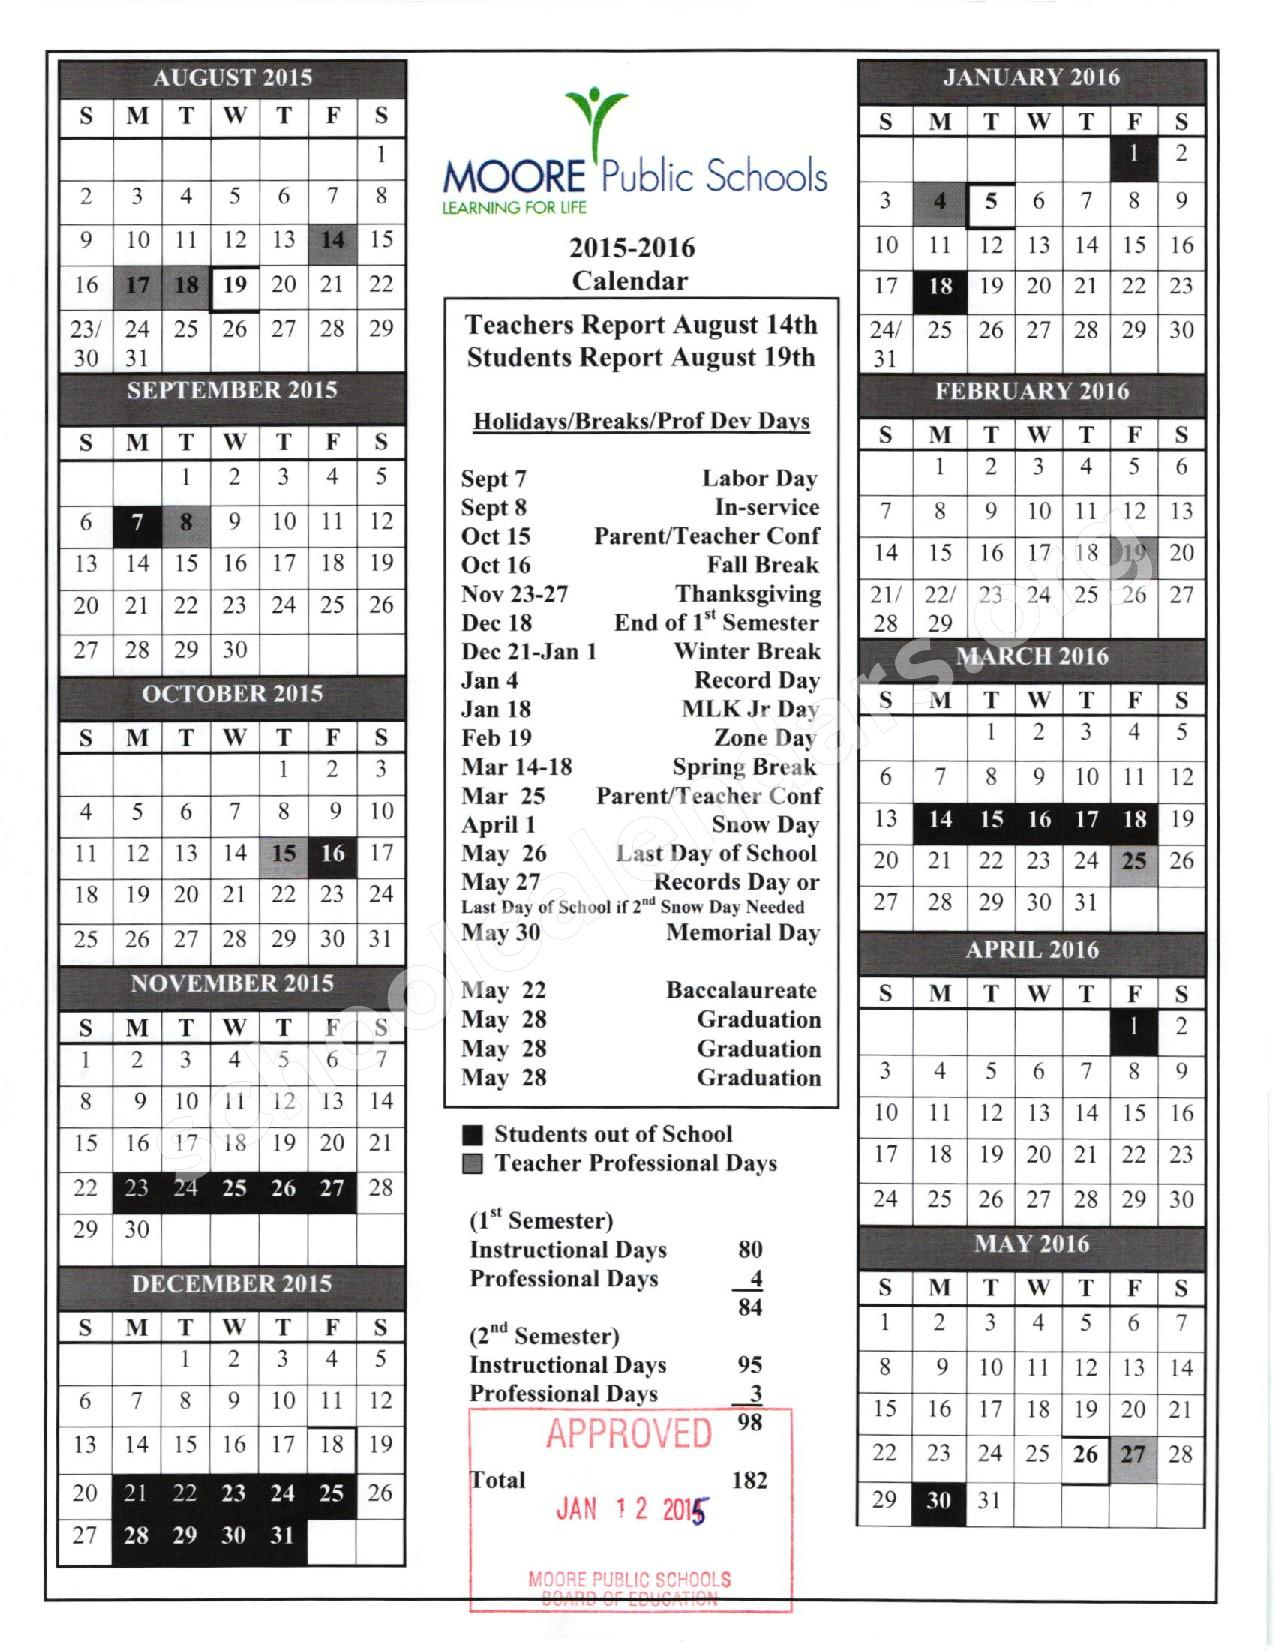 Moore School Calendar - Time Table regarding Printable School Calendar For Leeds City School 2022 2023